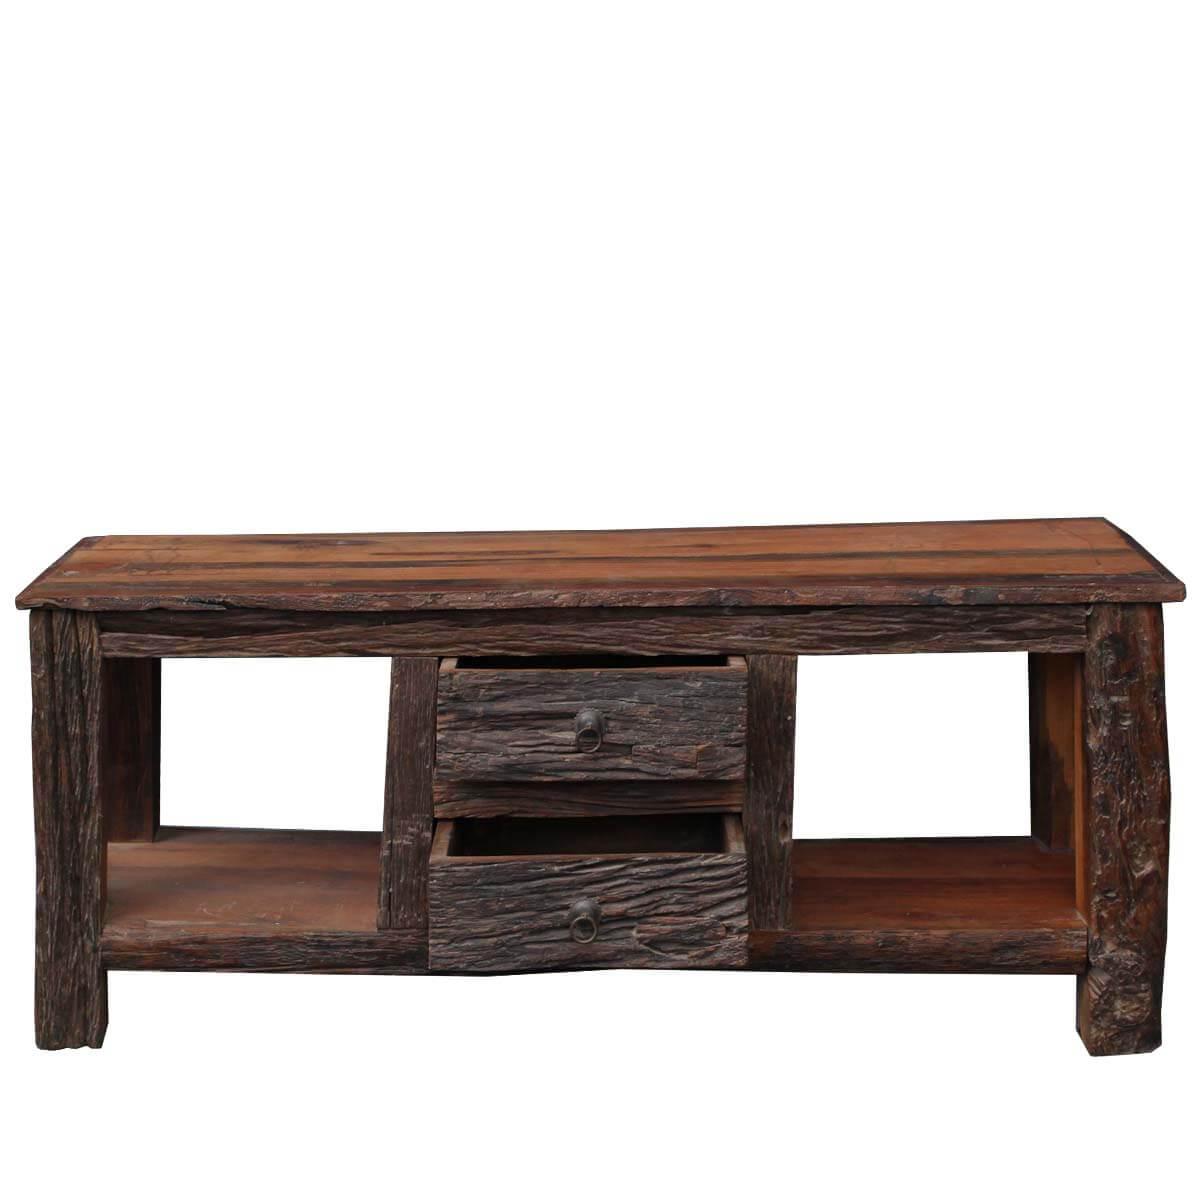 ... Rustic Bark Railraod Reclaimed Flat Screen Wood TV Stand Media Console  Table ... - Rustic Bark Railraod Reclaimed Wood Media Stand Console Table